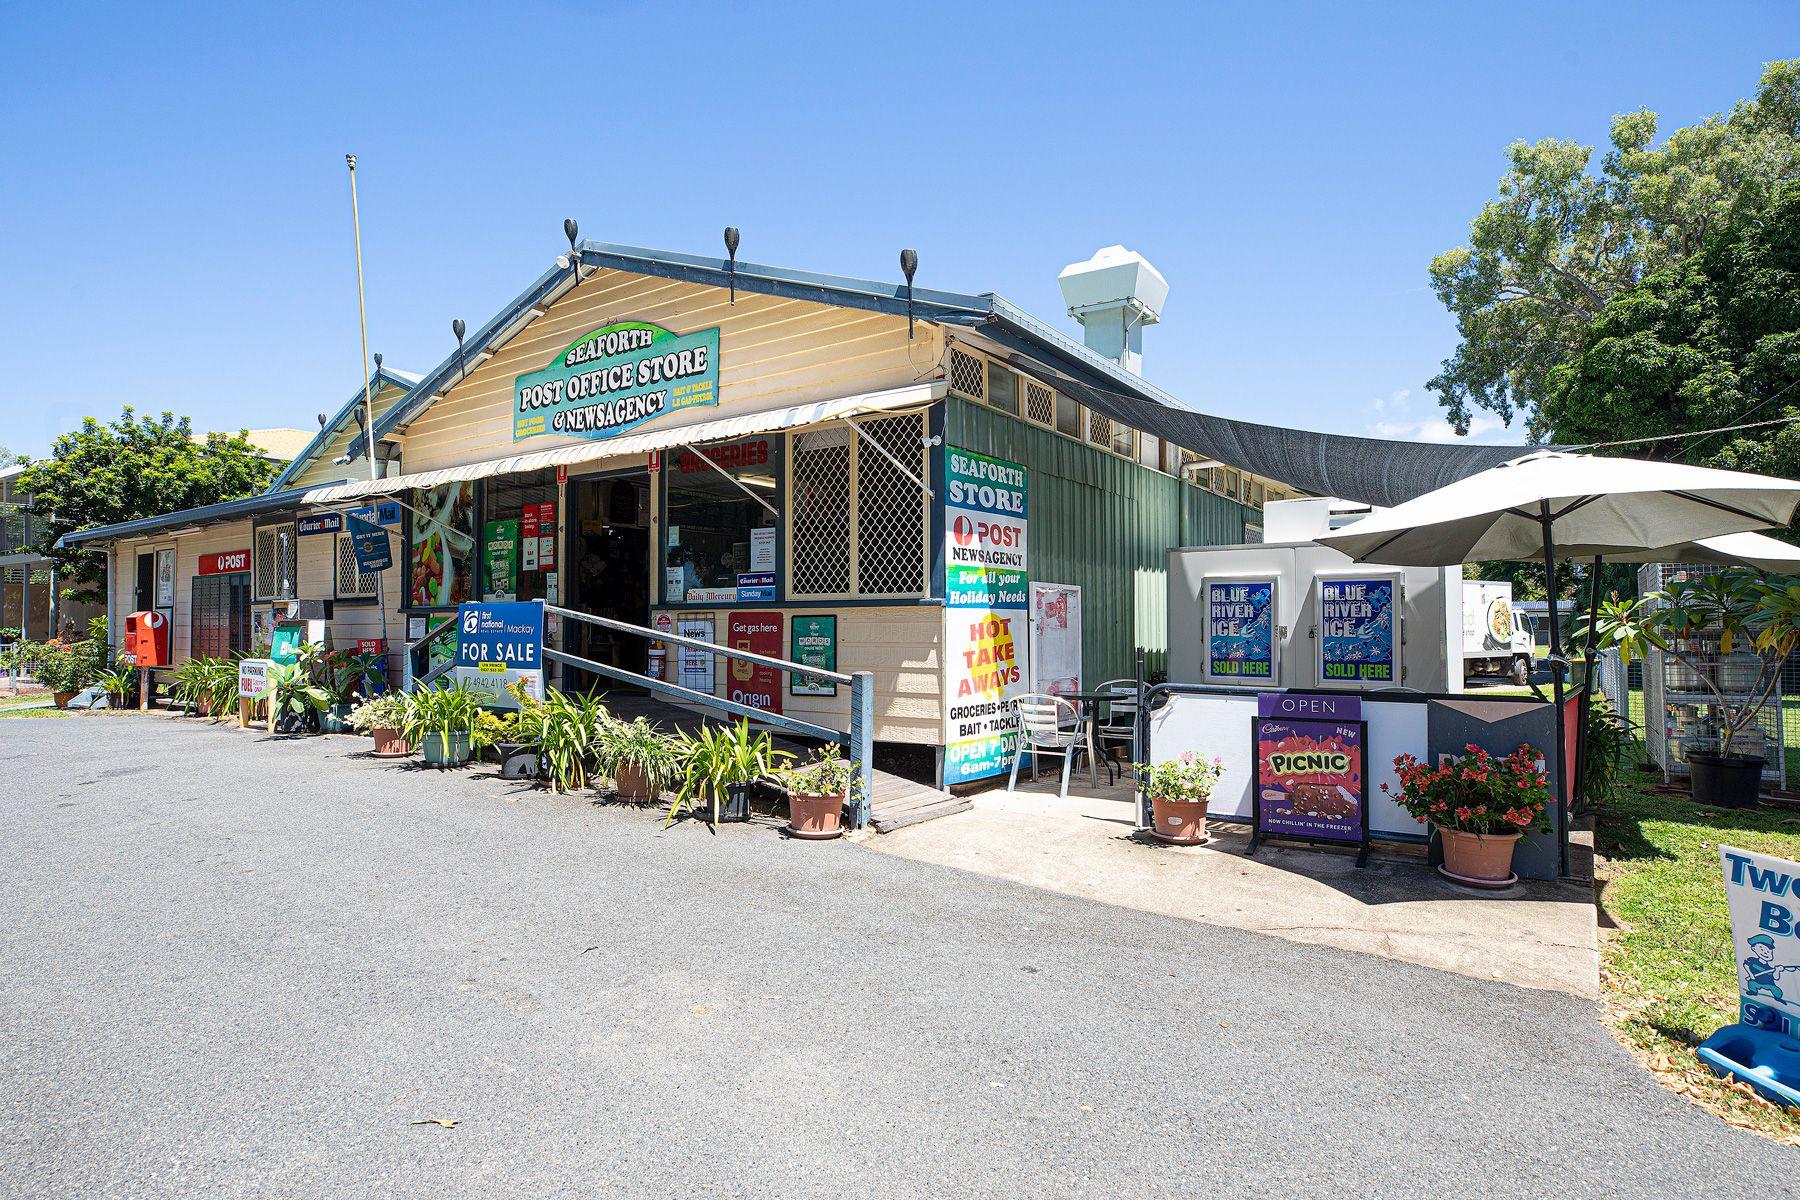 34 Palm Avenue, Seaforth, QLD 4741